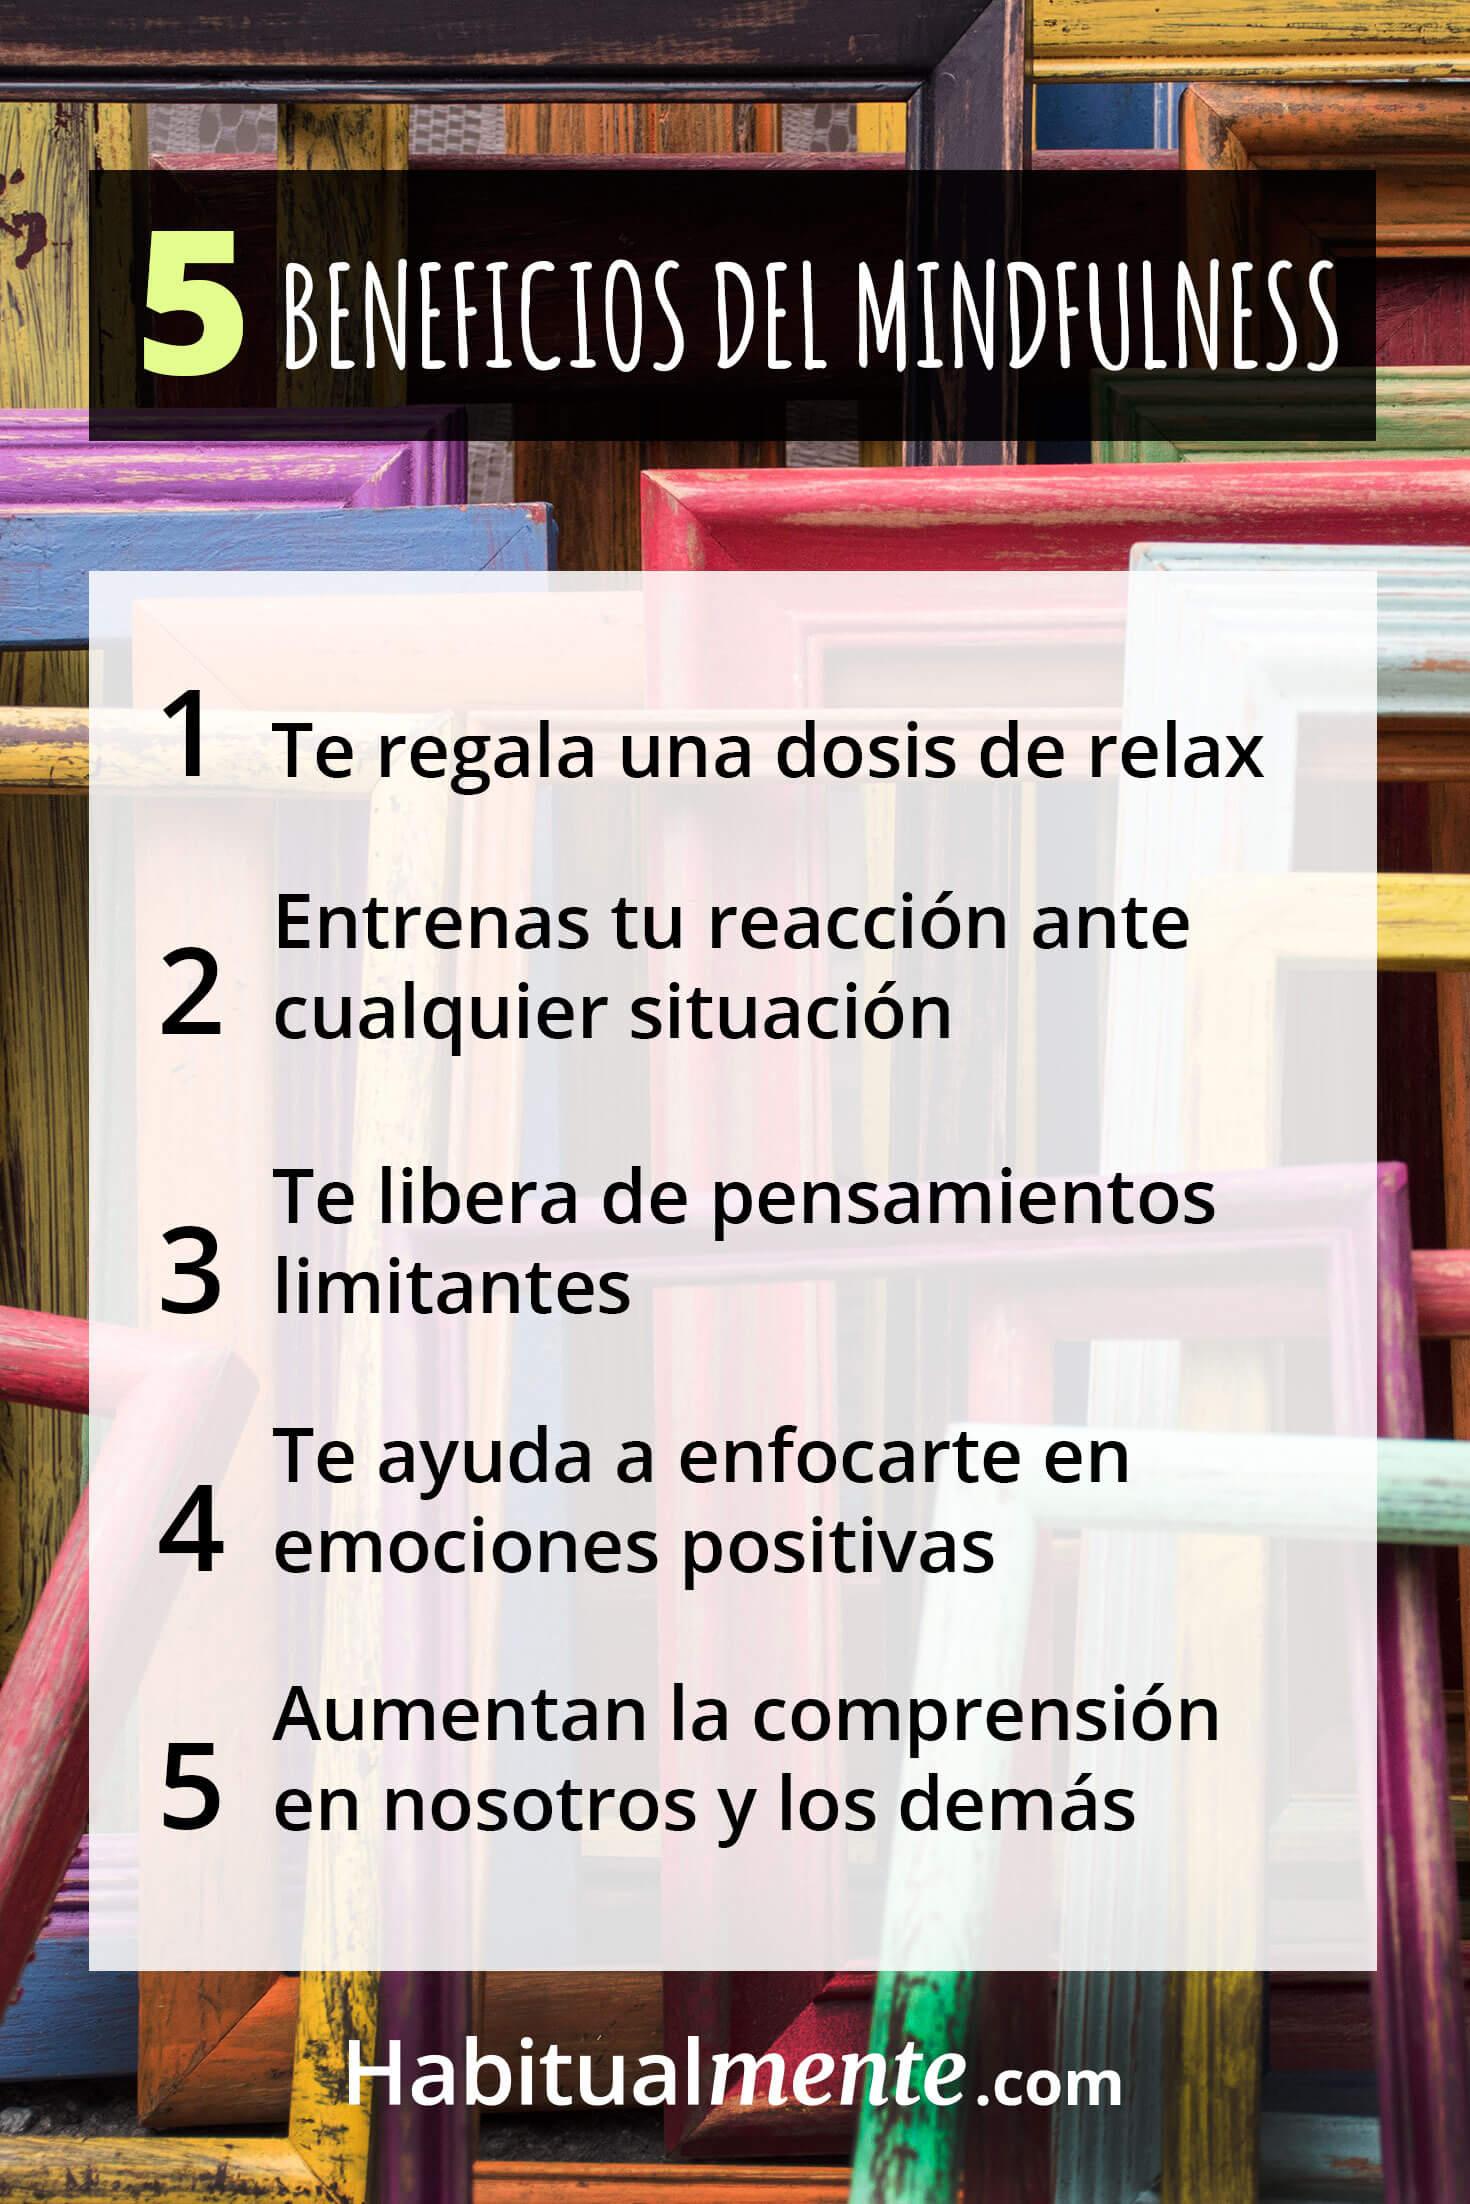 5 beneficios del mindfulness